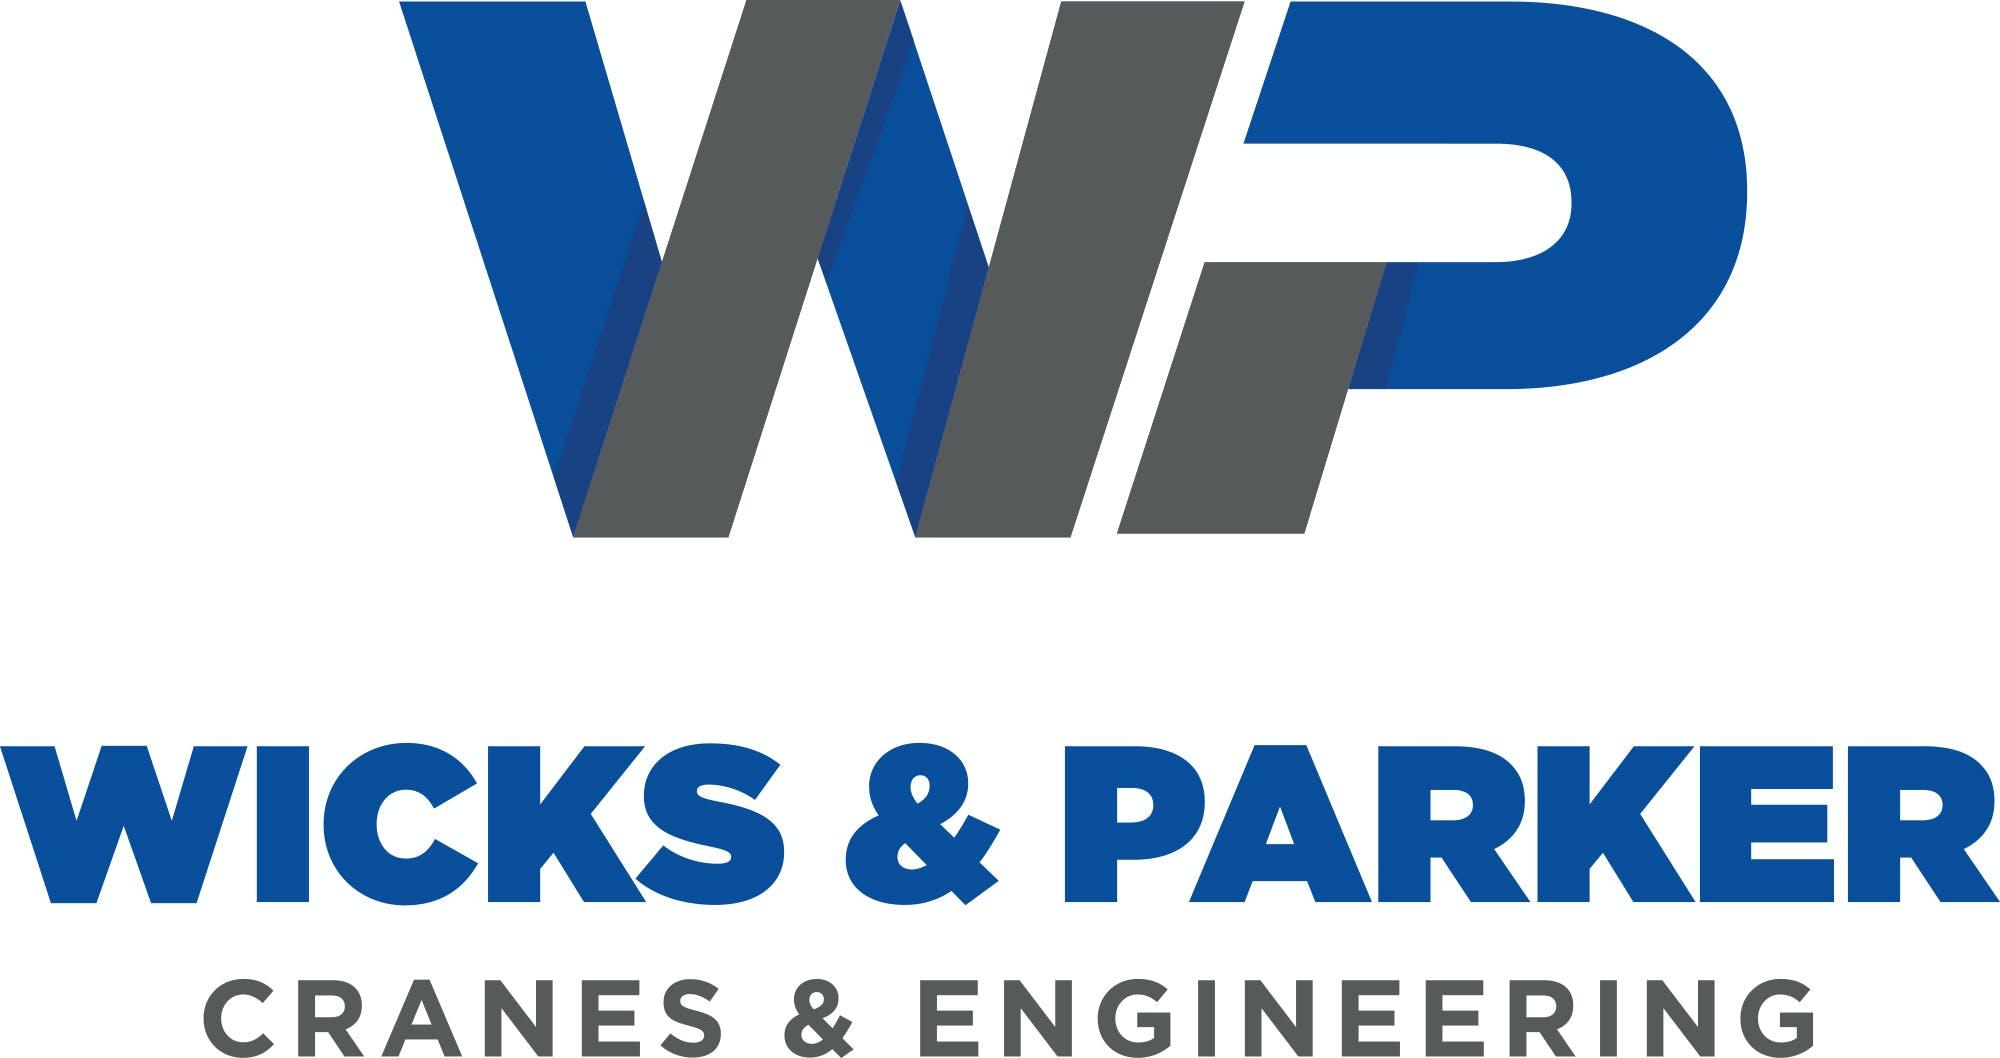 Wicks and Parker Cranes